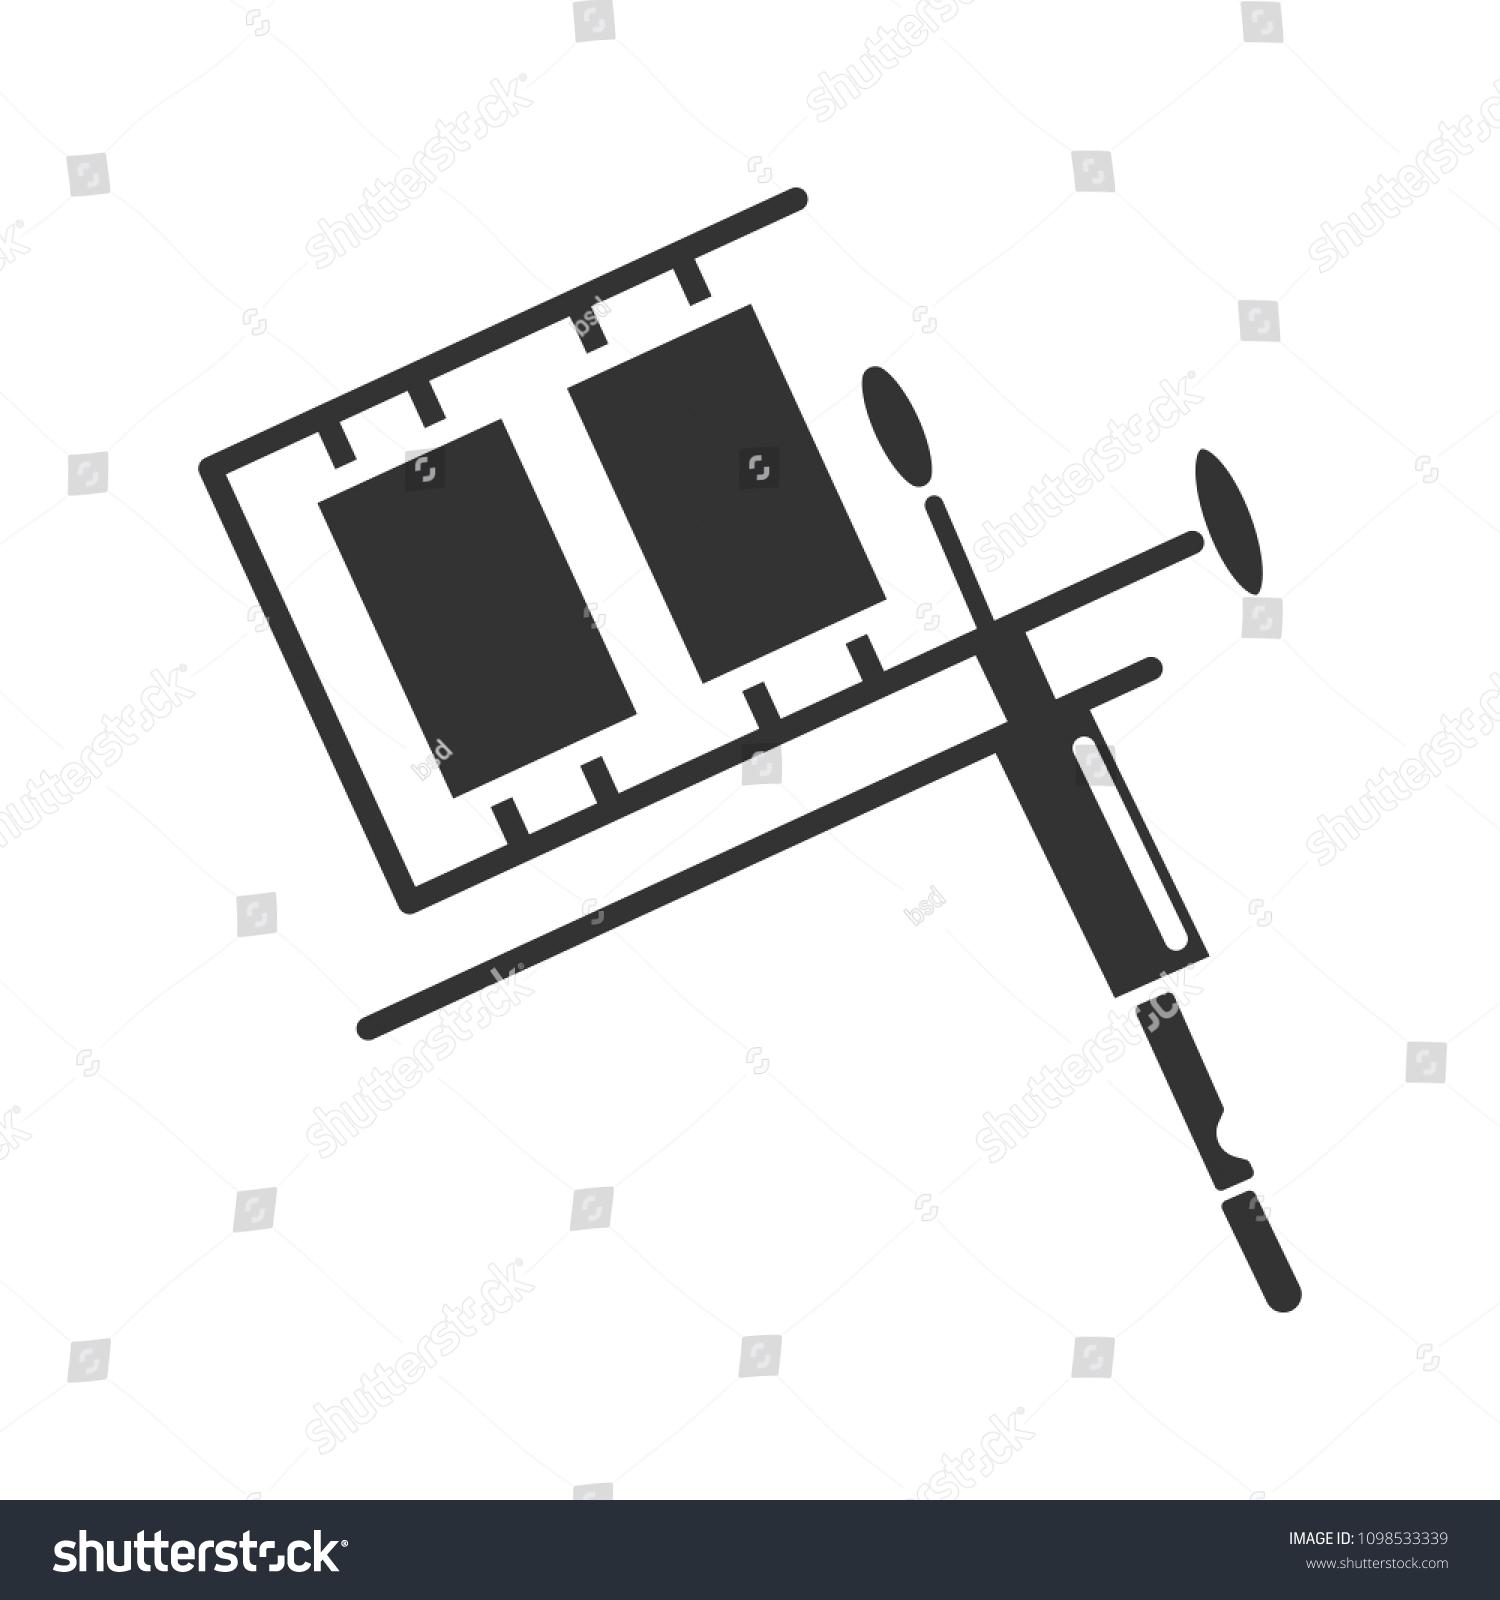 Tattoo Machine Glyph Icon Silhouette Symbol Stock Illustration Gun Diagram Negative Space Raster Isolated